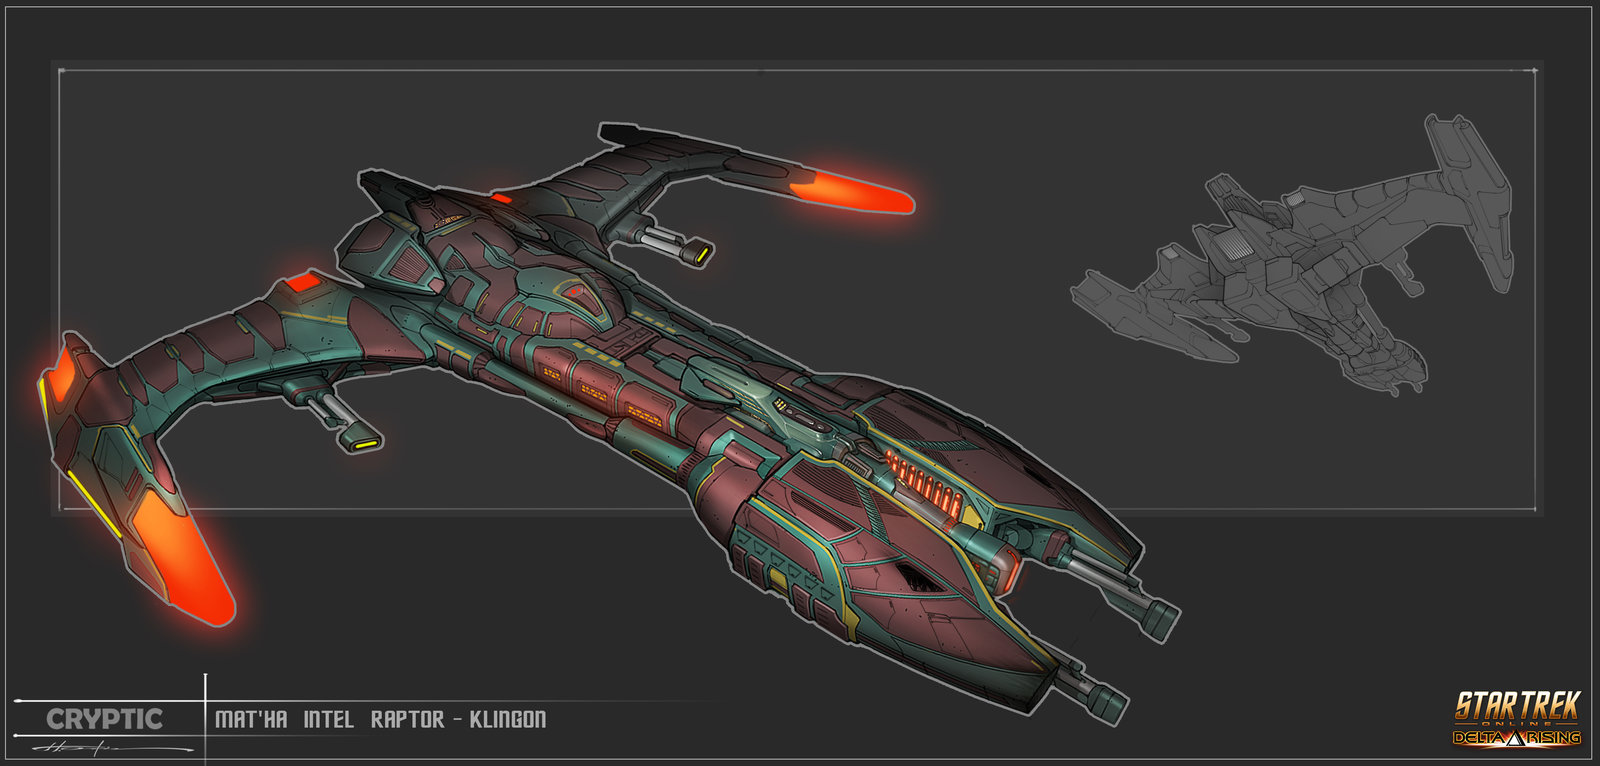 Mat'ha Intel Raptor - Klingon Empire